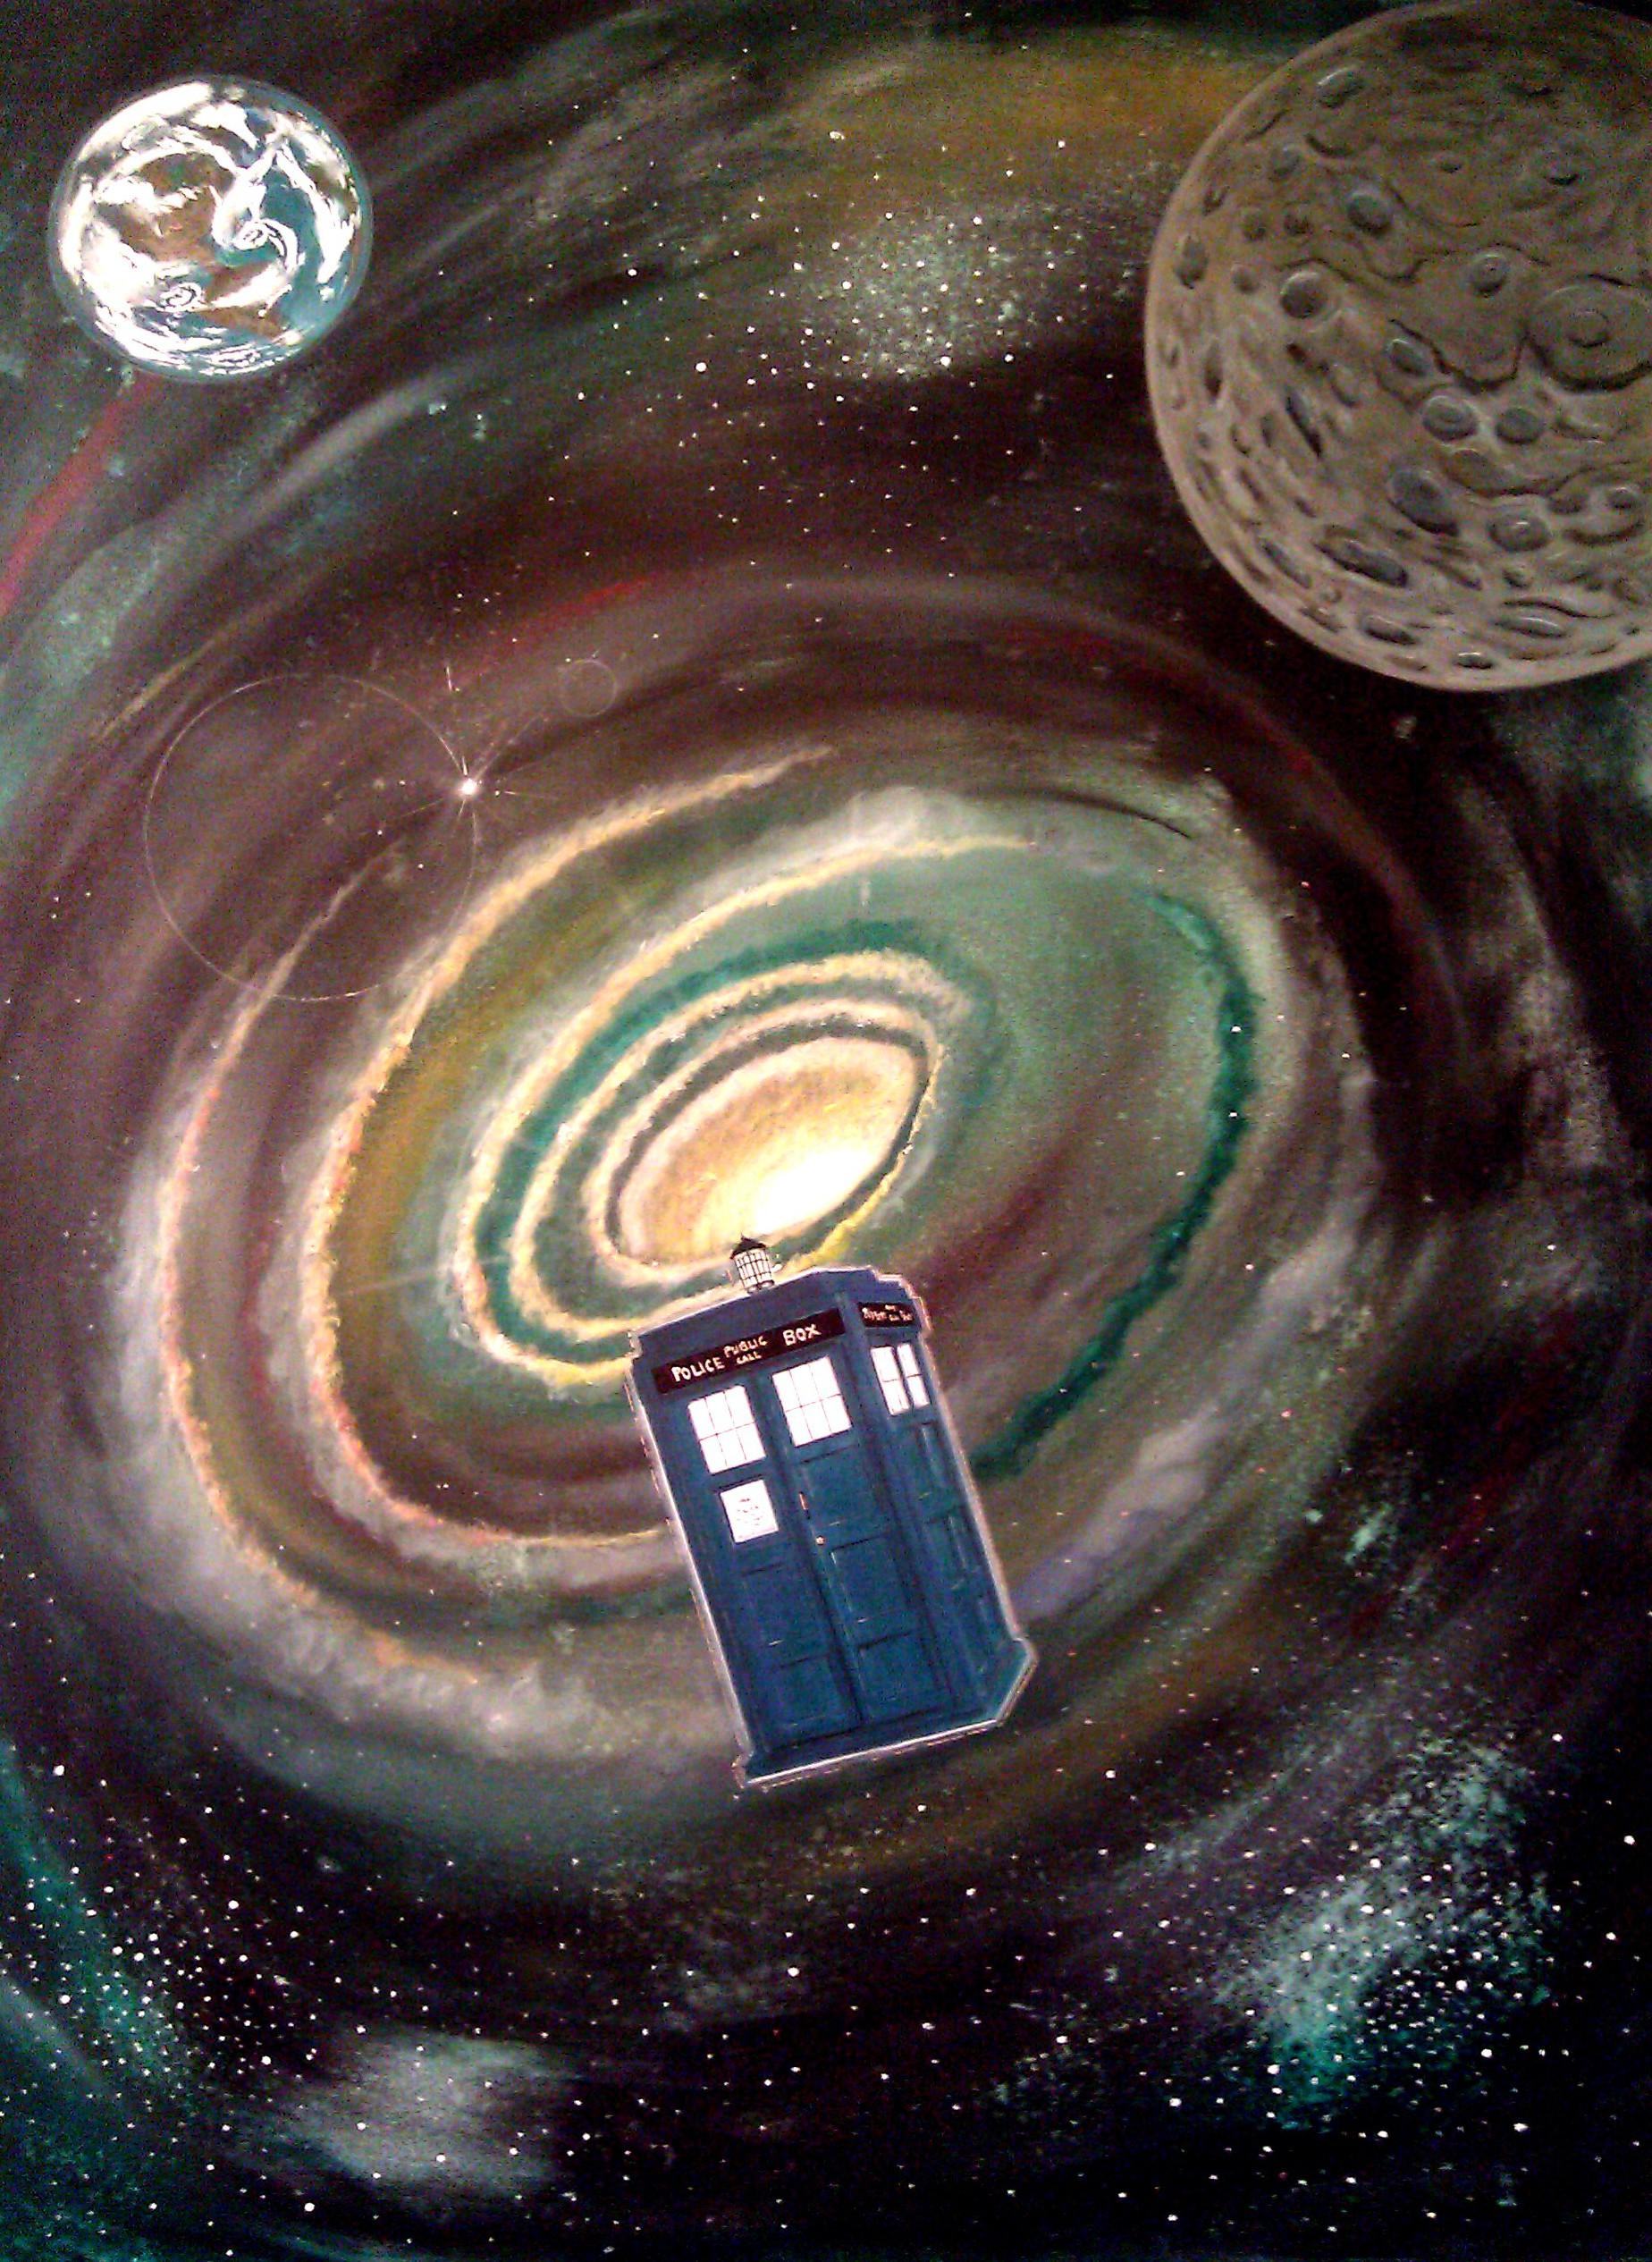 tardis dual screen doctor who 5 doctor who tardis 1848x2530